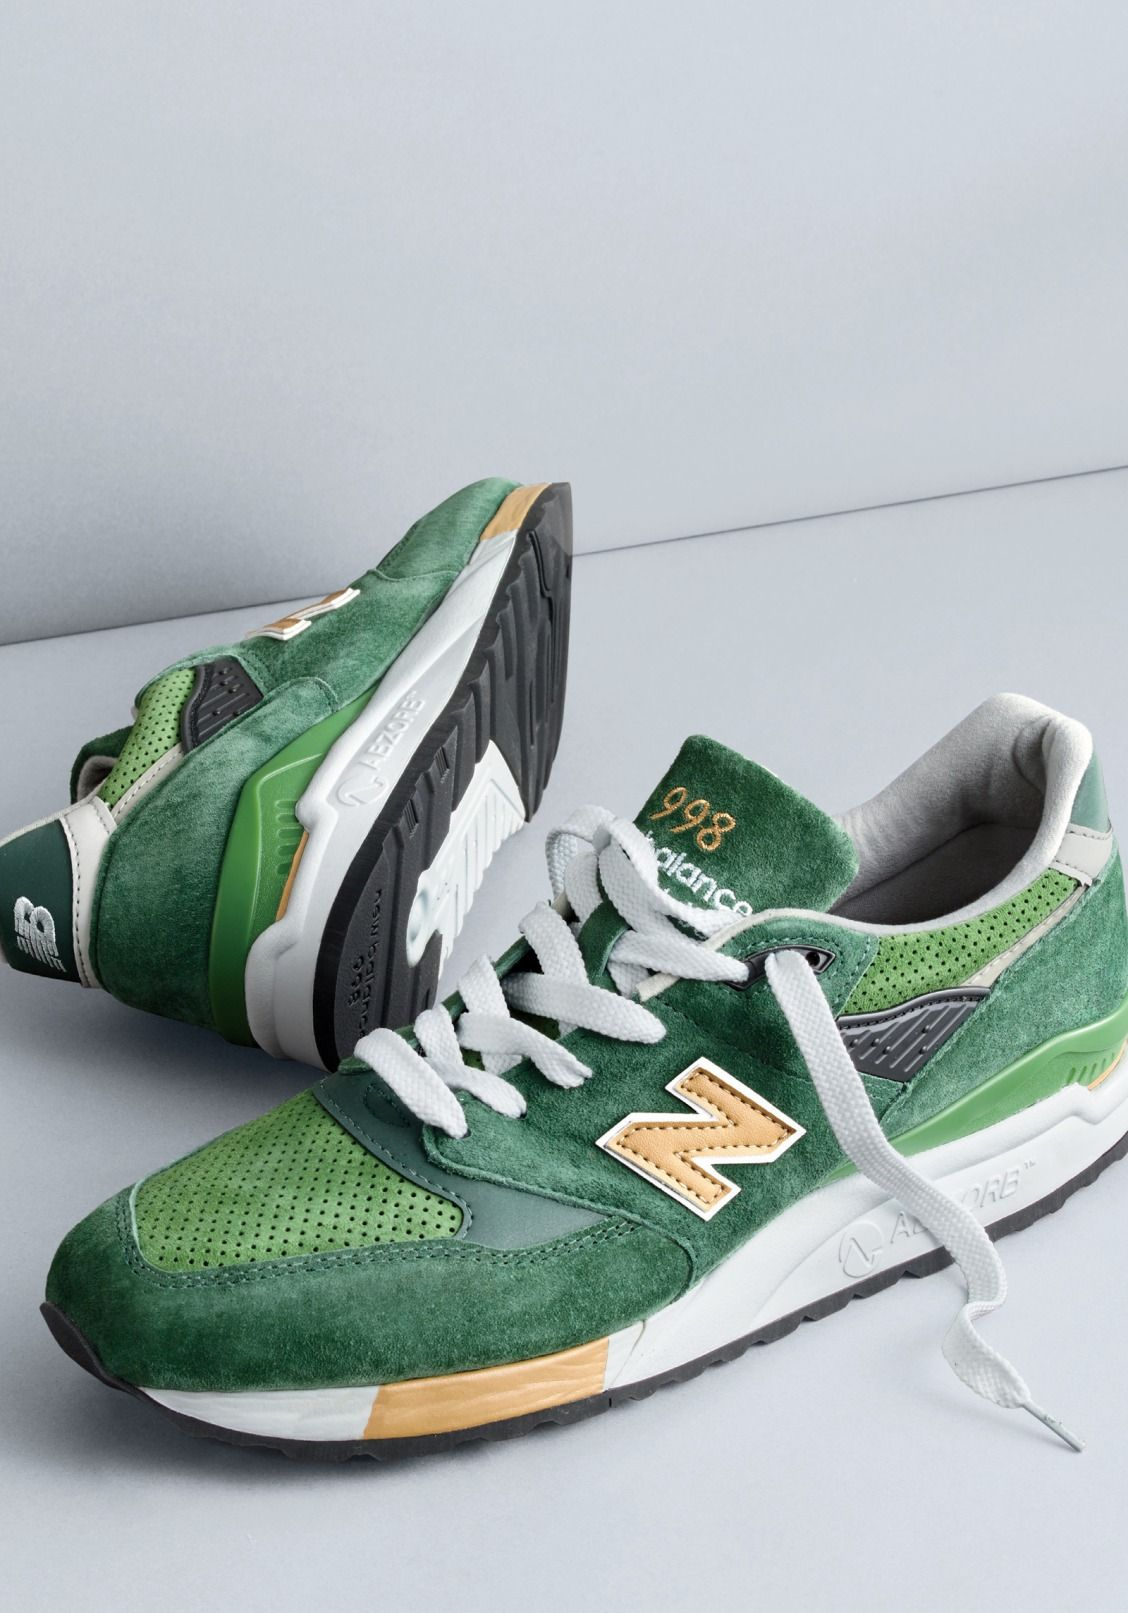 official photos 1b796 cc21a New Balance® for J.Crew 998 Greenback sneaker.